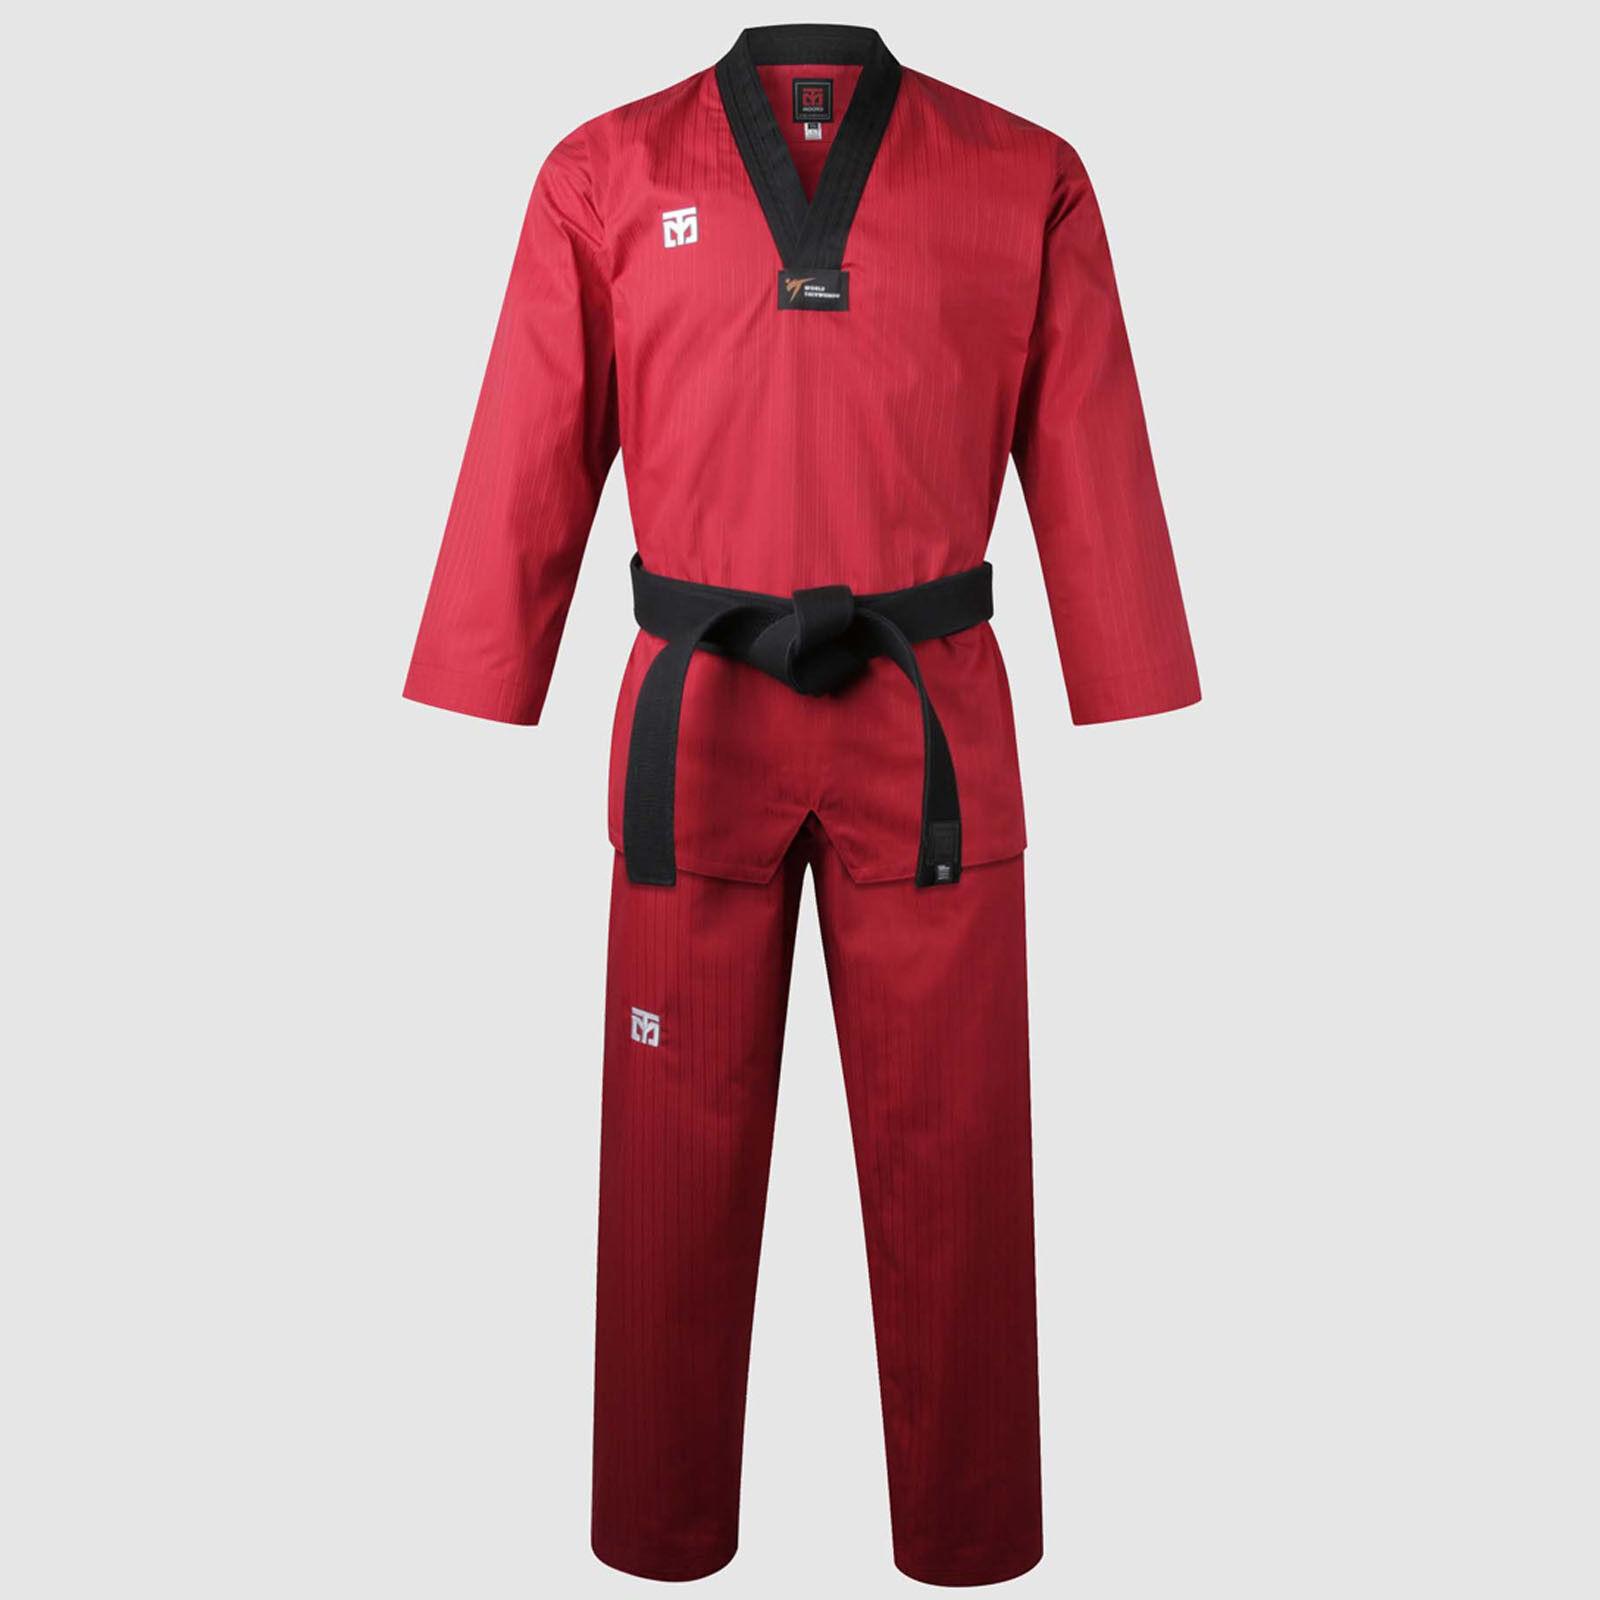 Taekwondo Red colord Uniforms Mooto BS4.5 New WT Logo Doboks Suits Martial Arts